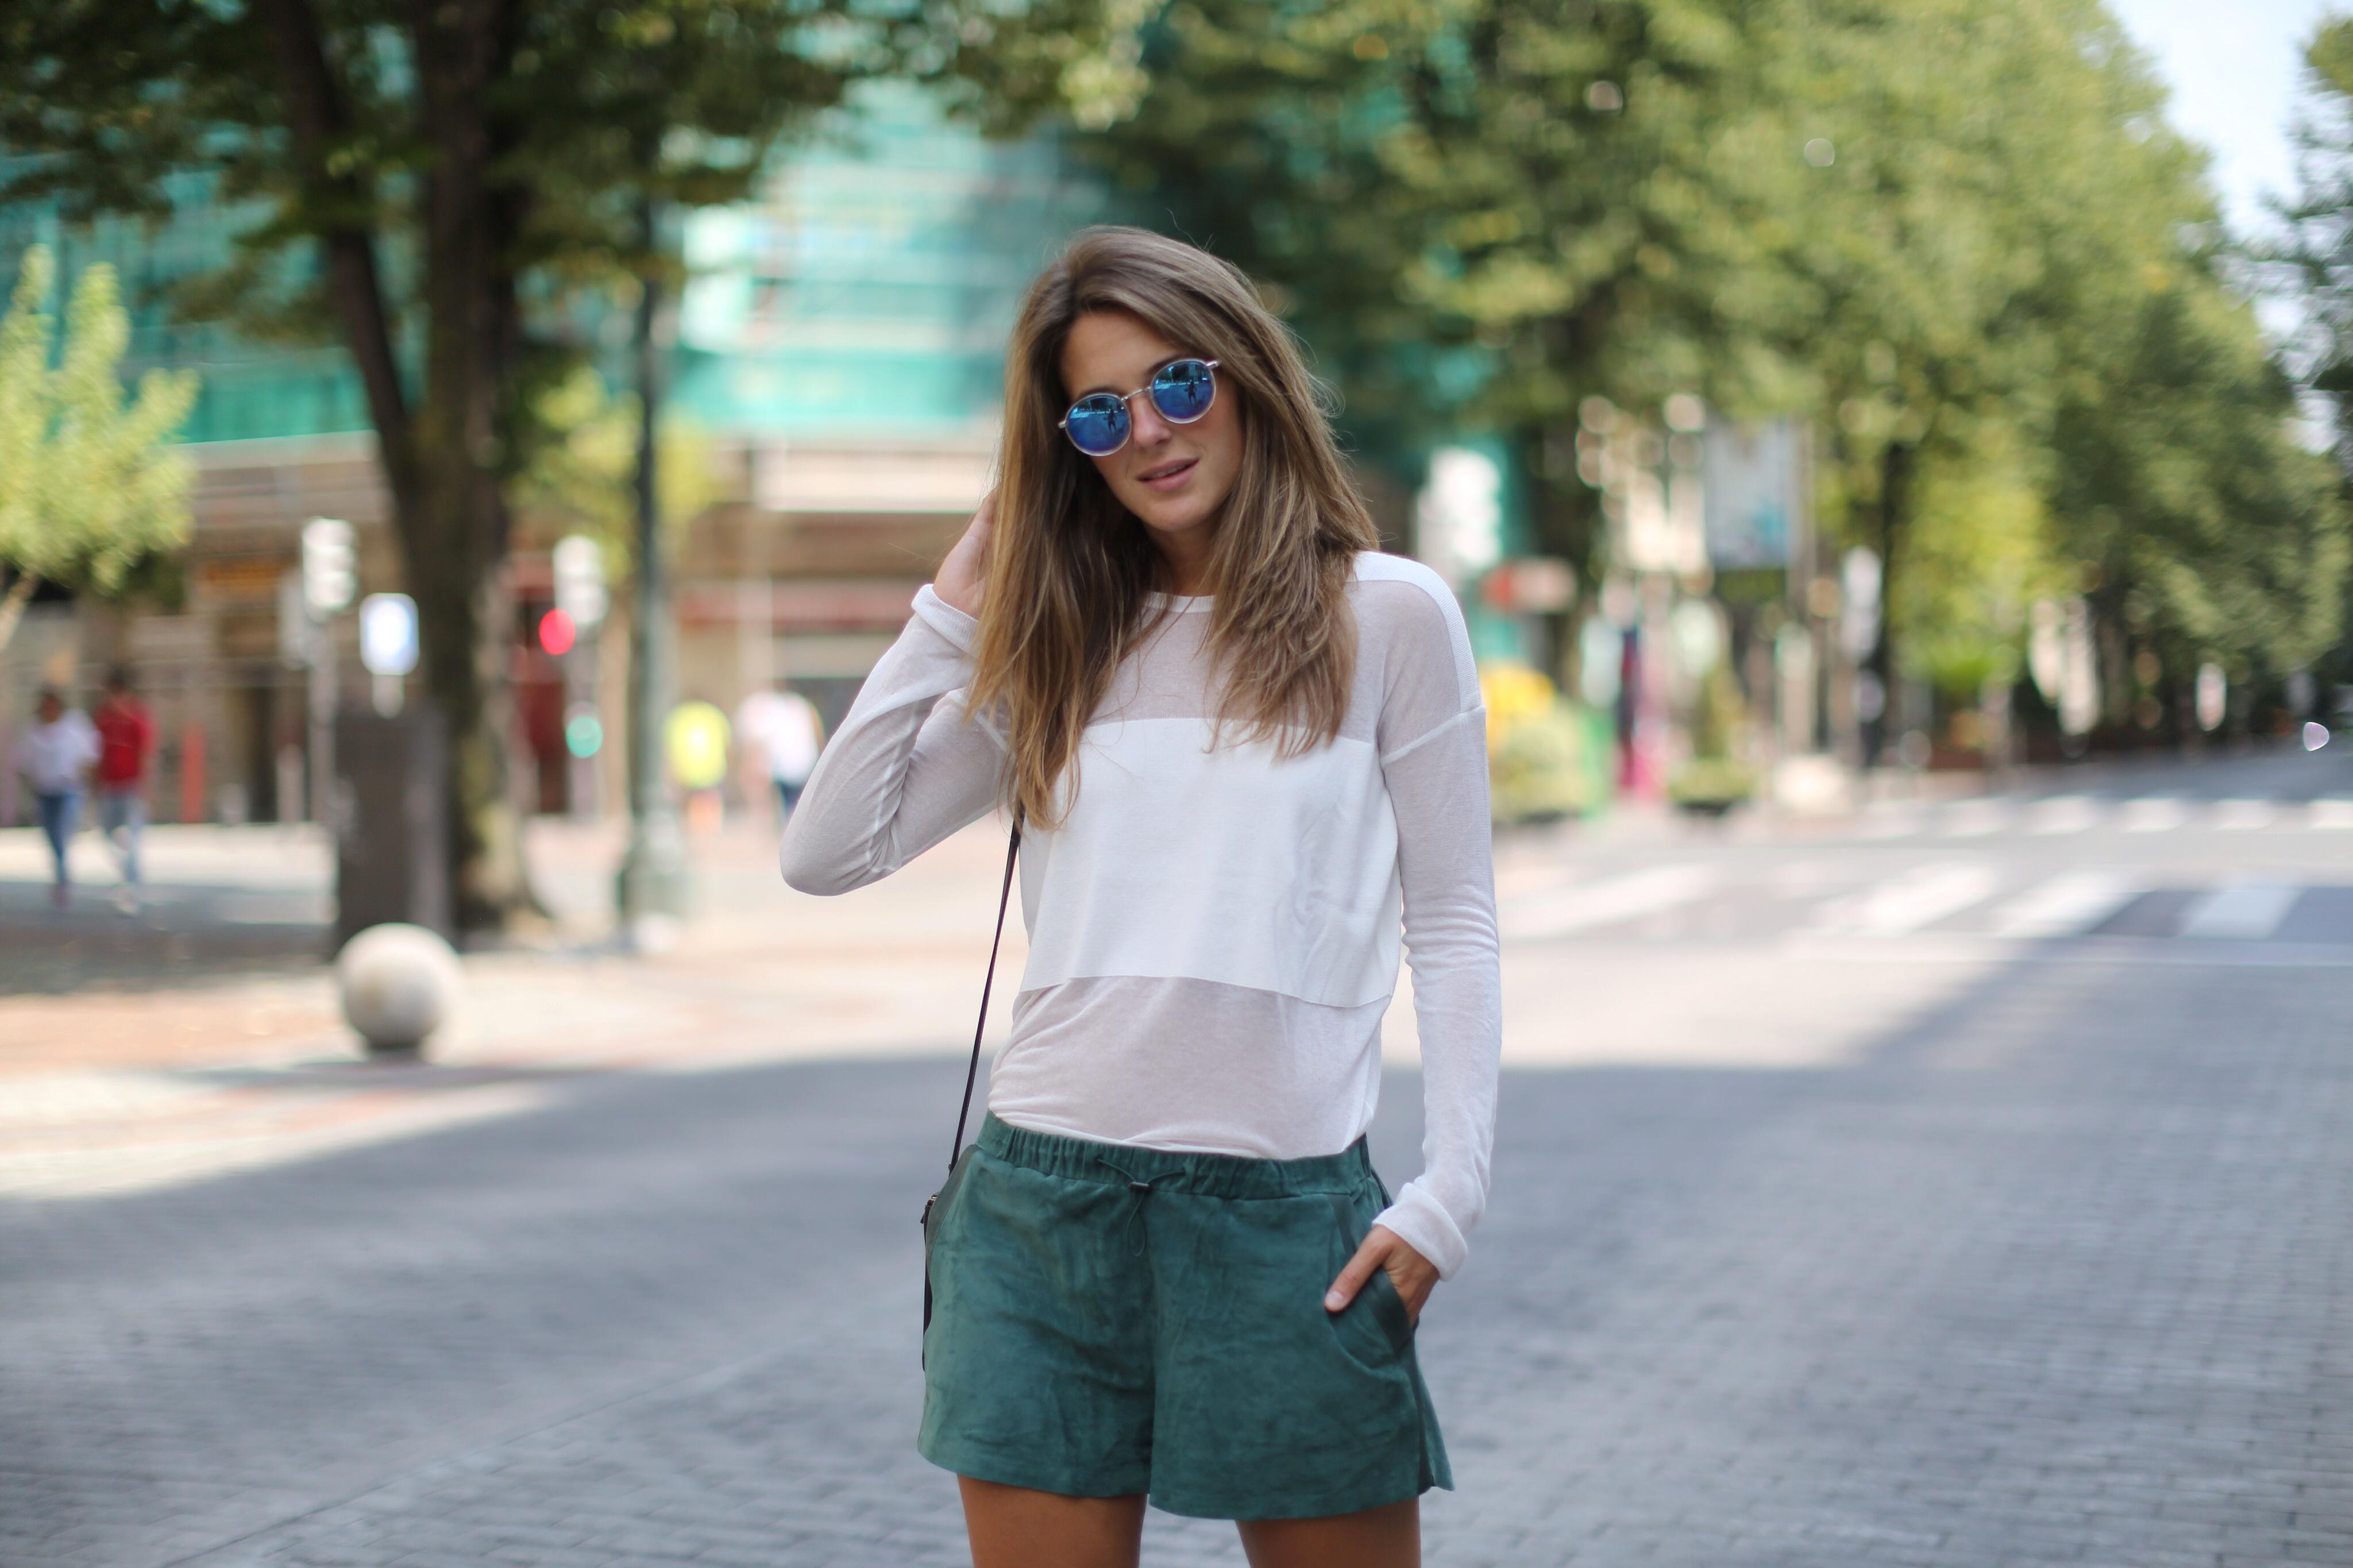 Clochet_h&m_trend_suede_shorts_converse_celine_trio_bag_05